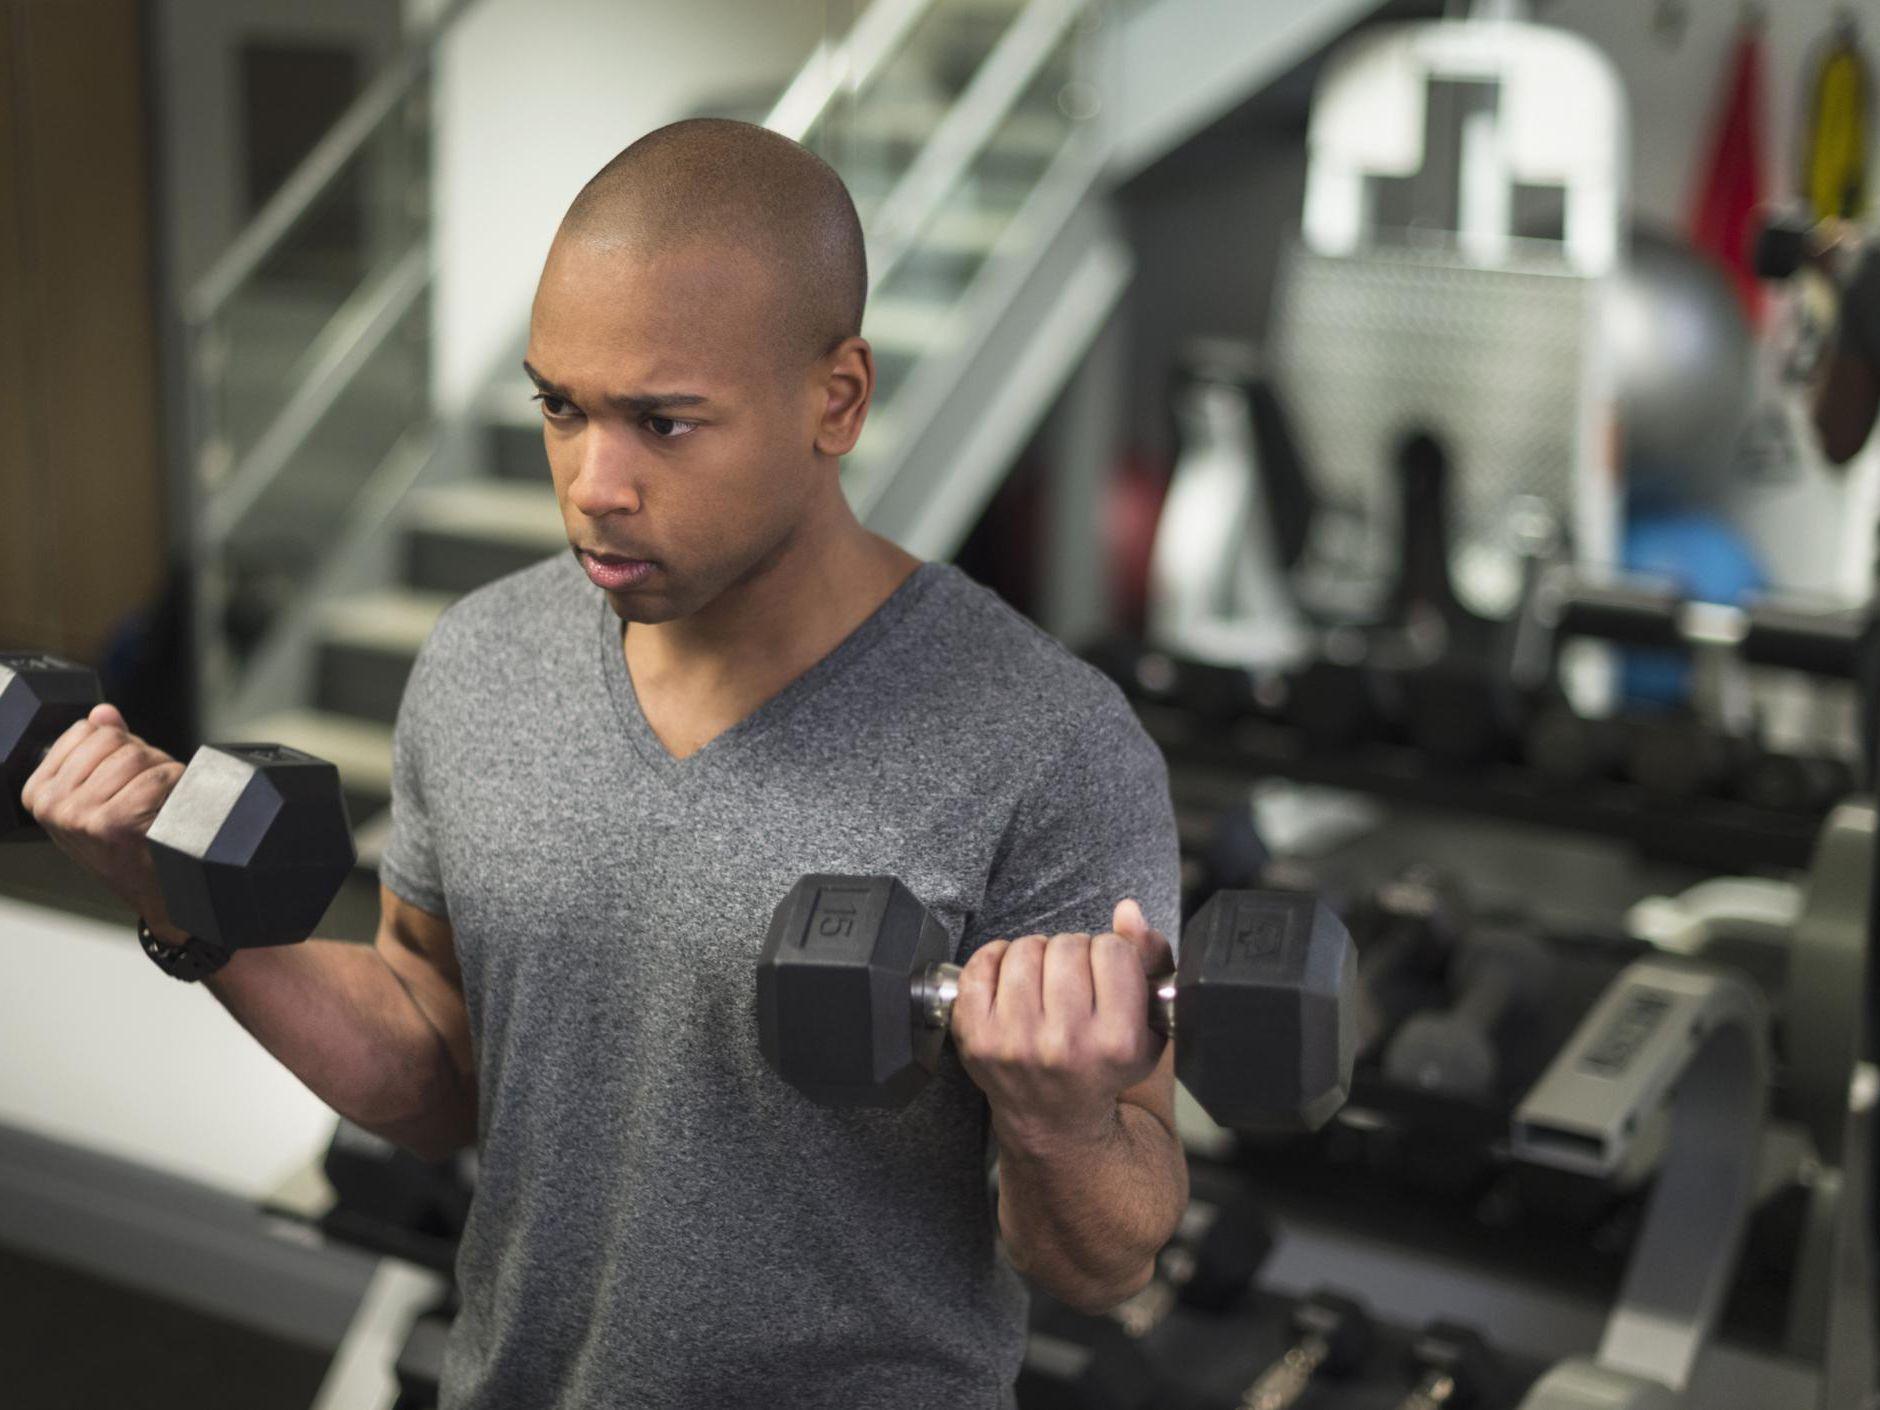 lifting weights definition gambling